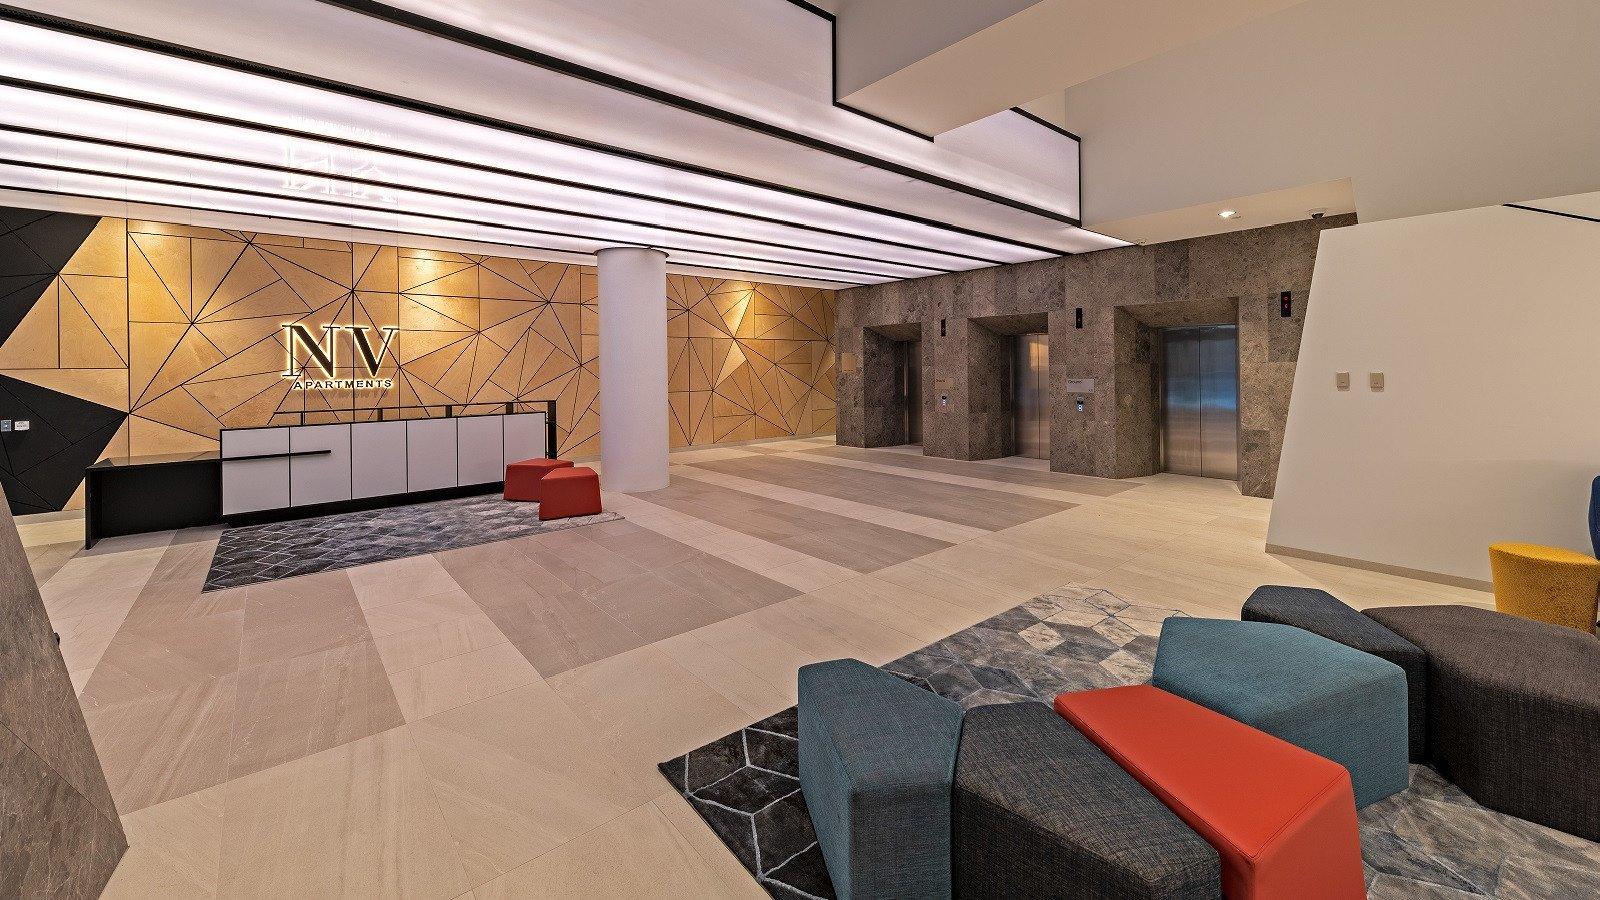 NV Apartments-image-6